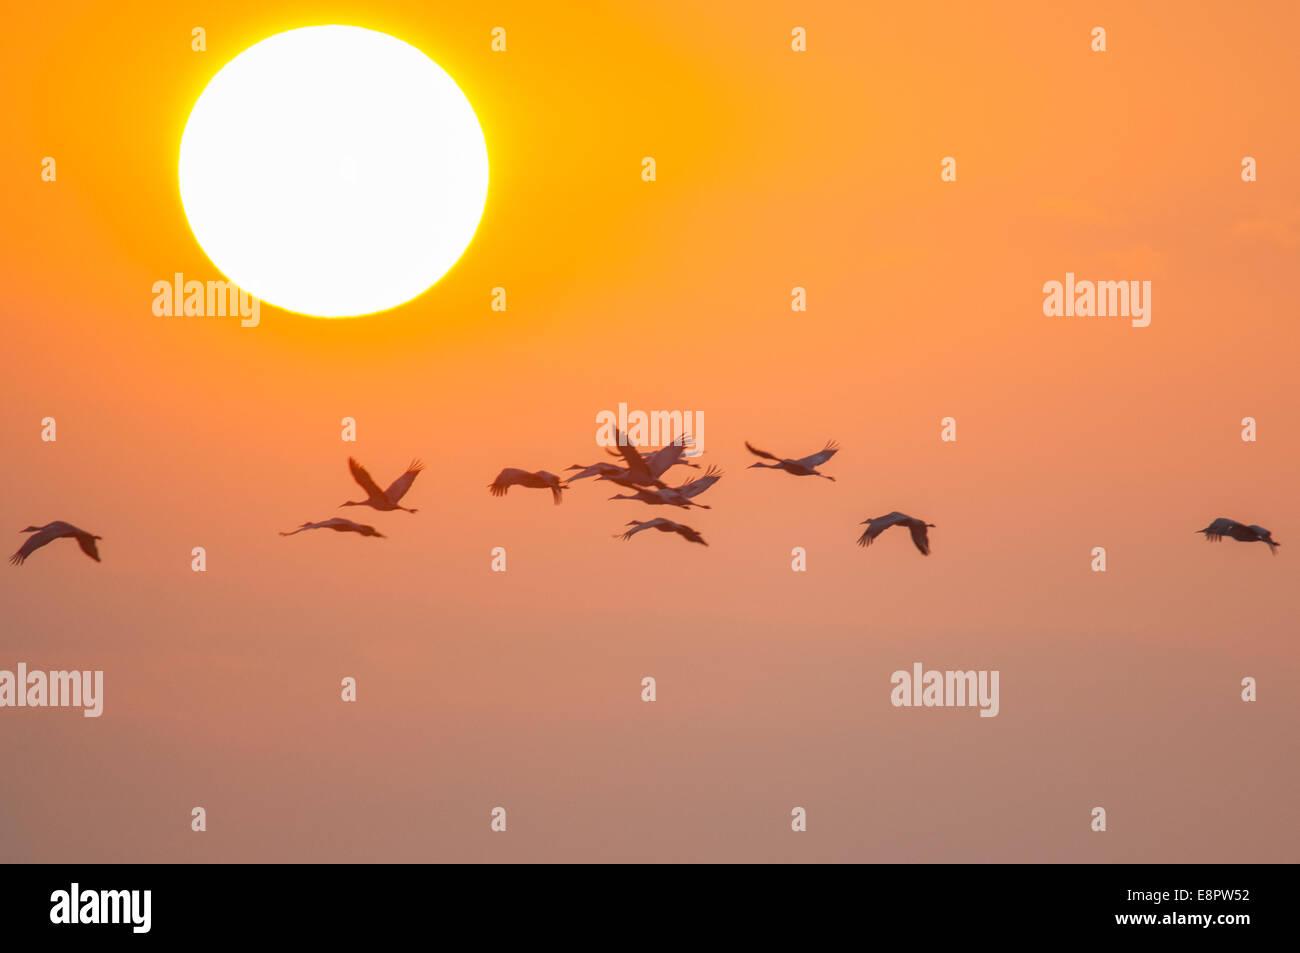 Sandhill Cranes flying at sunrise. - Stock Image